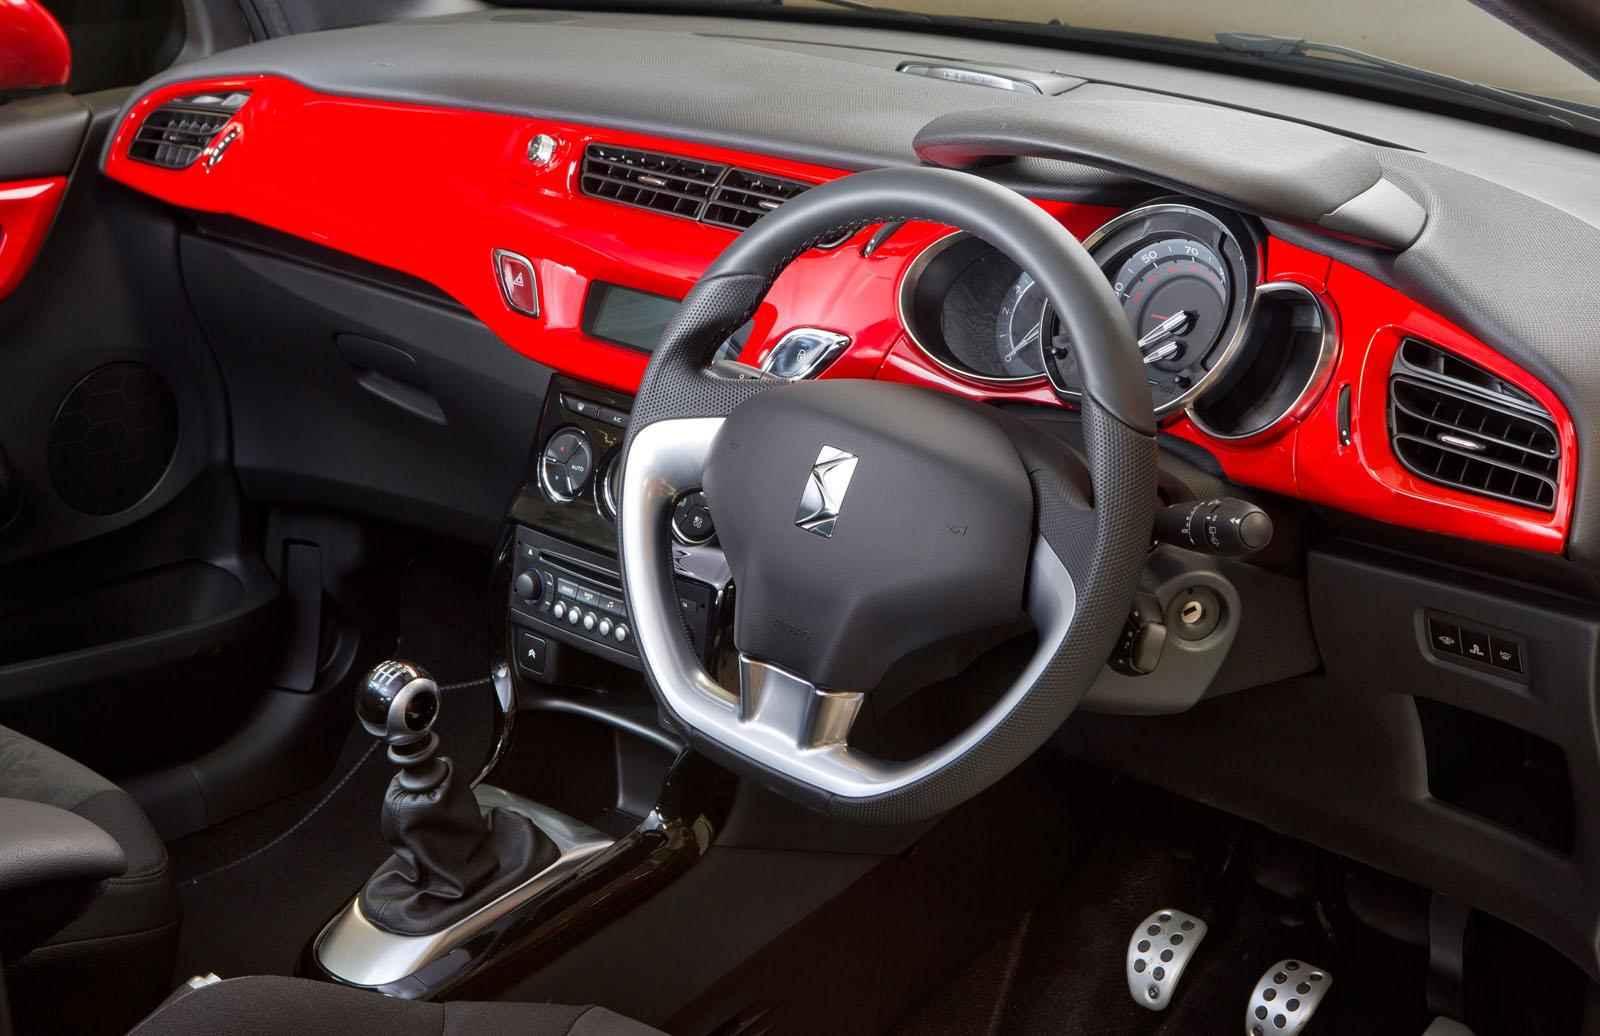 citroen ds3 red edition czerwono mi motoryzacja. Black Bedroom Furniture Sets. Home Design Ideas